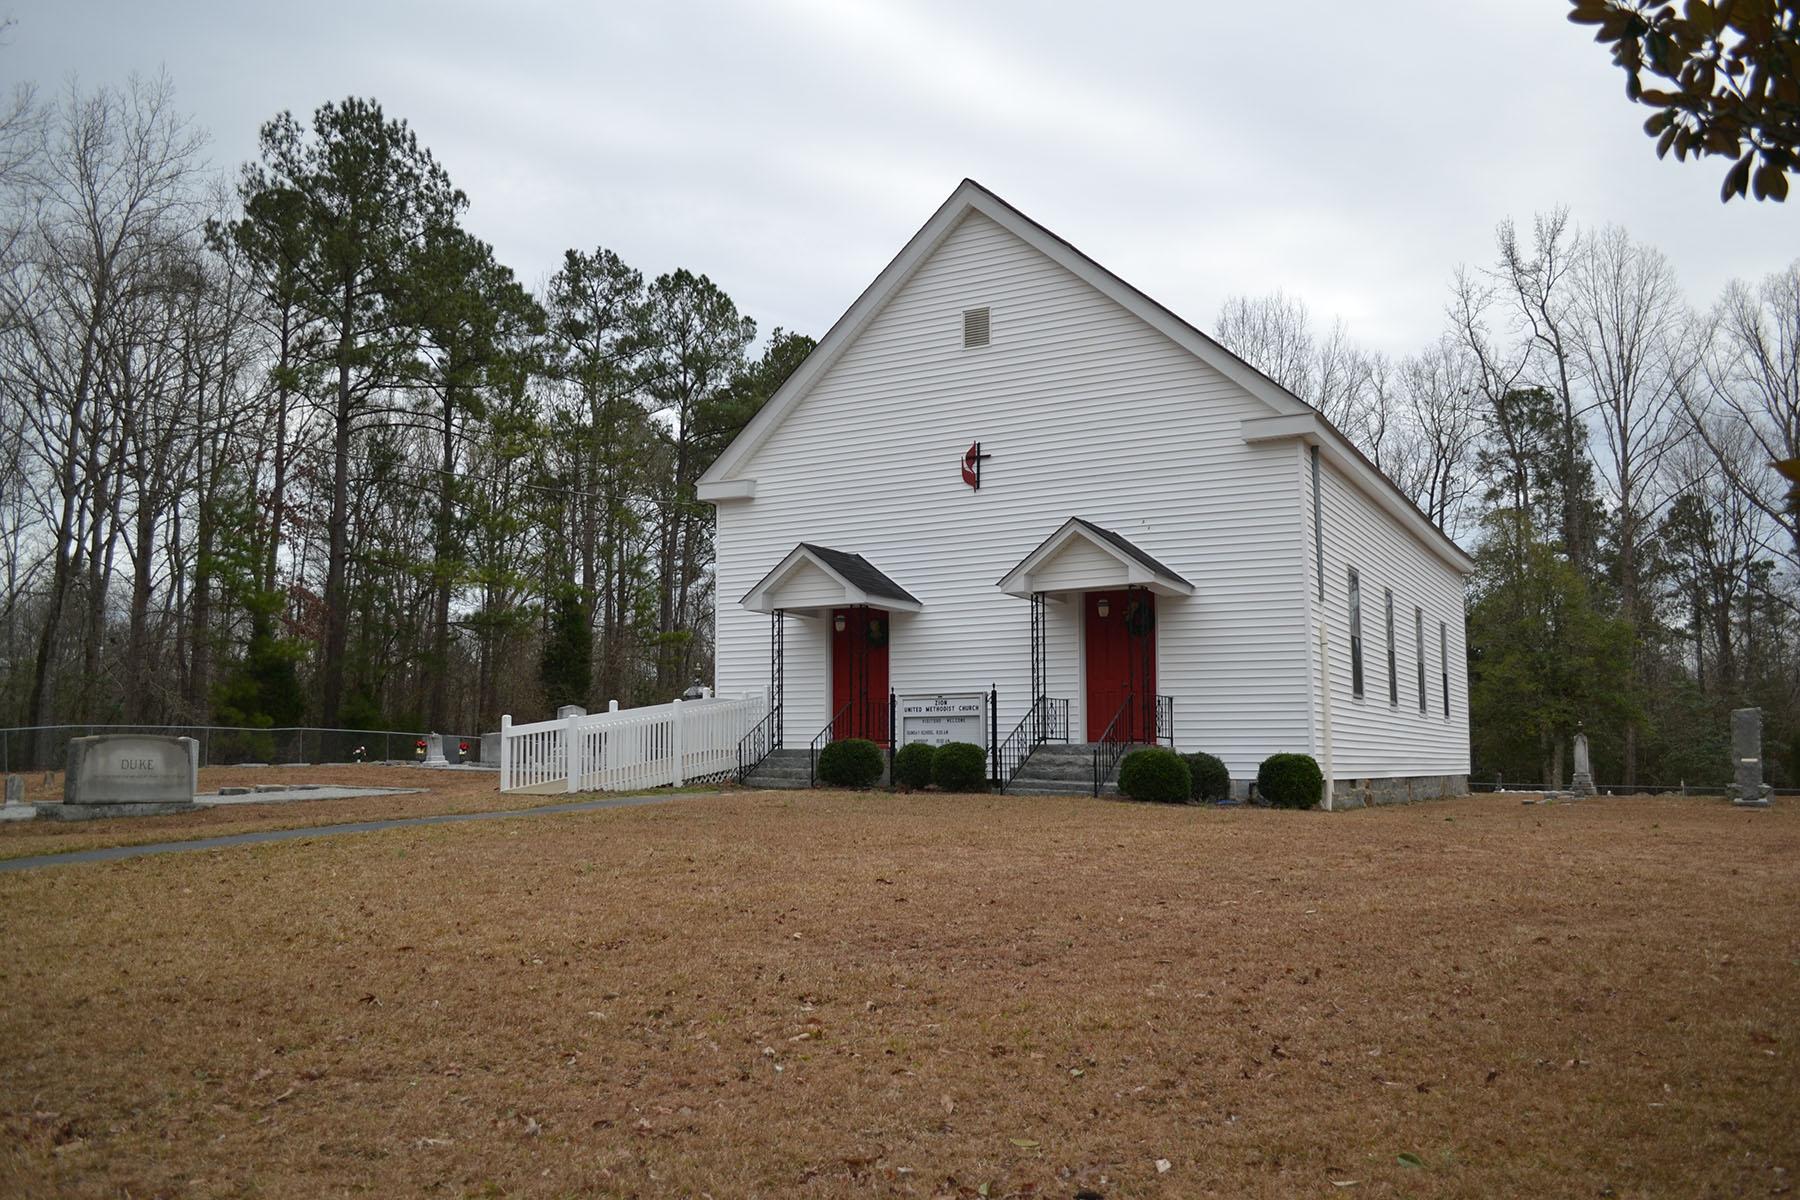 Zion Methodist Church.  Photo taken by Jim McLean in 2012.